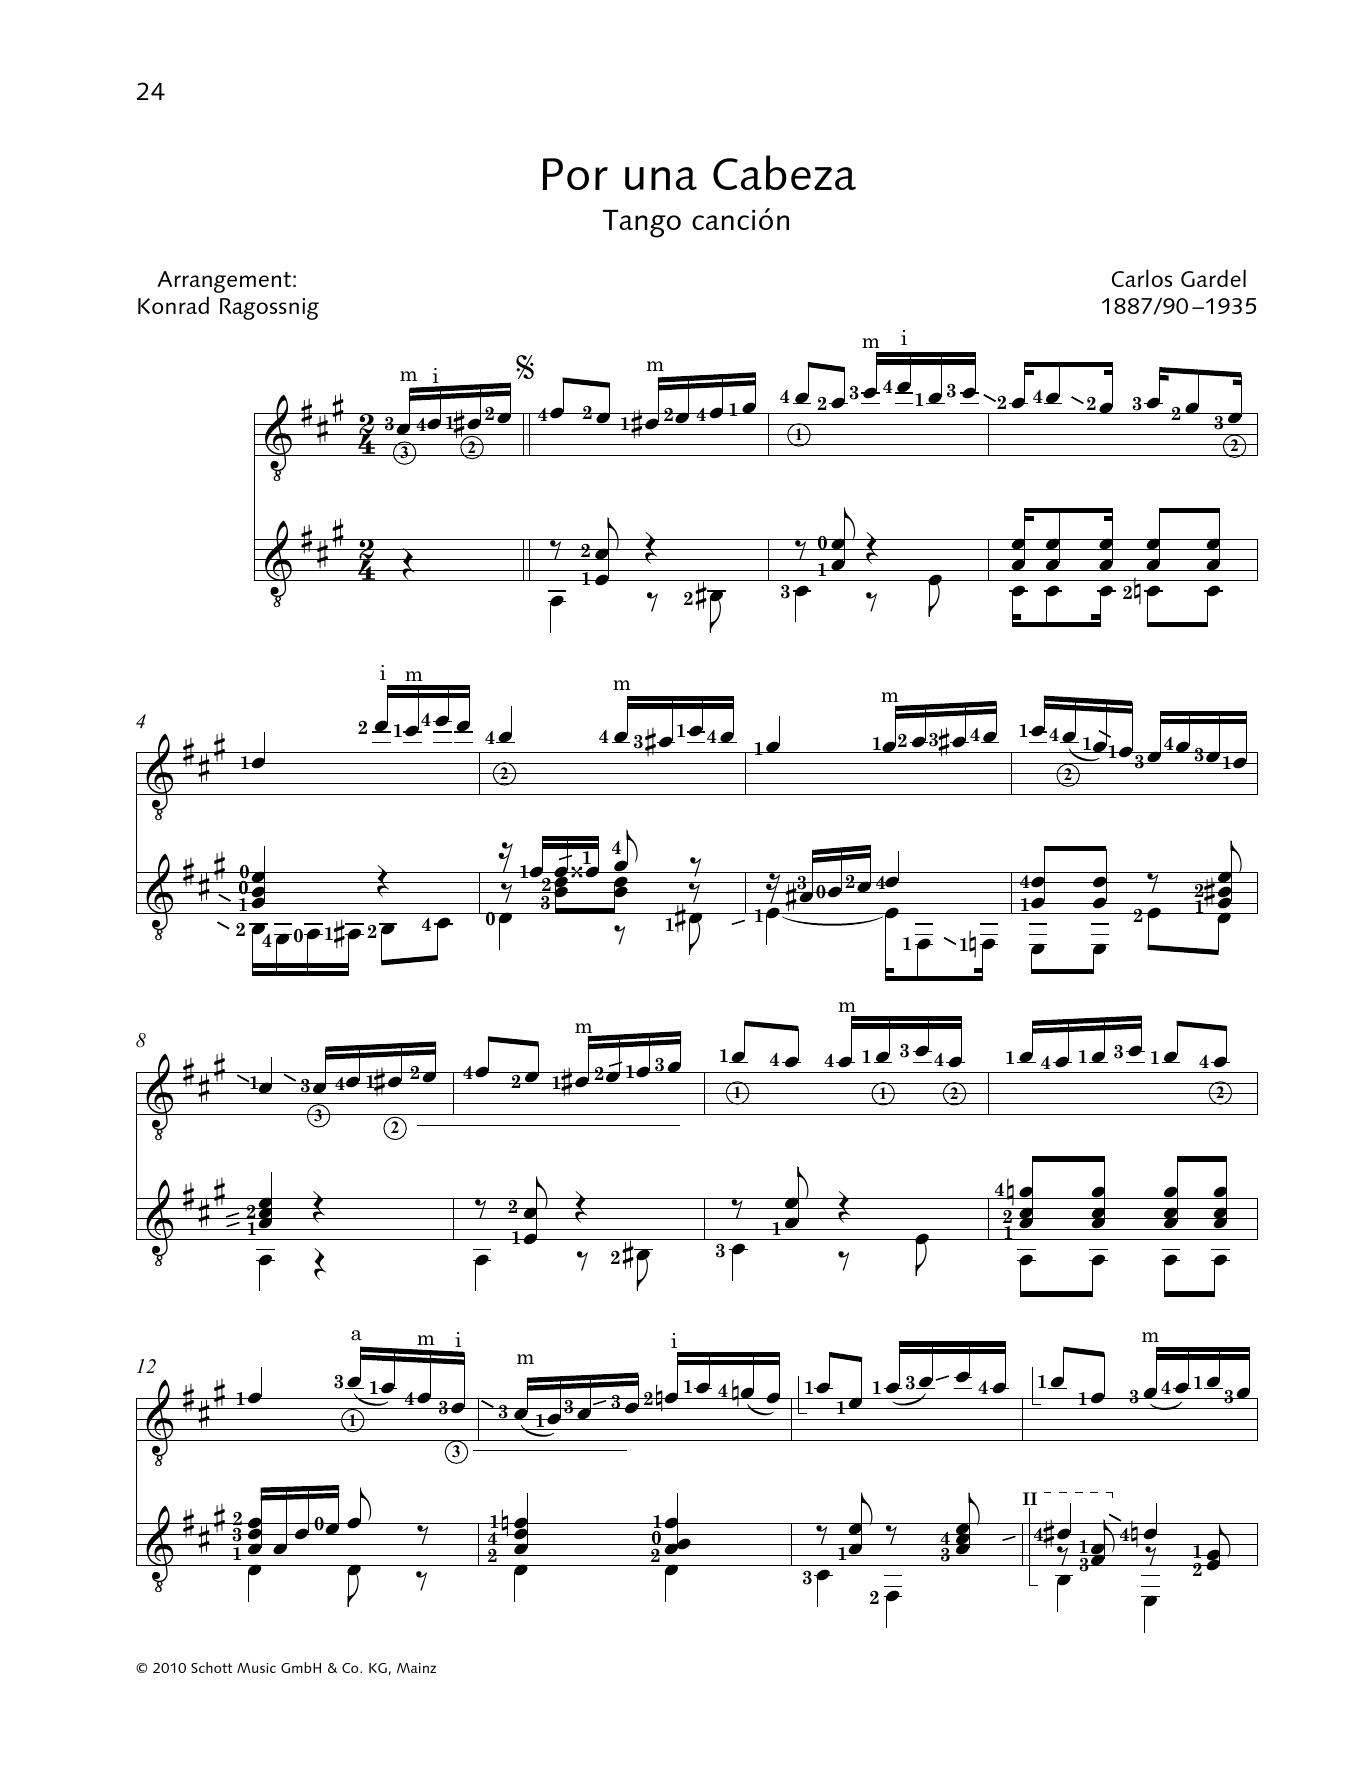 Por Una Cabeza - Full Score Sheet Music